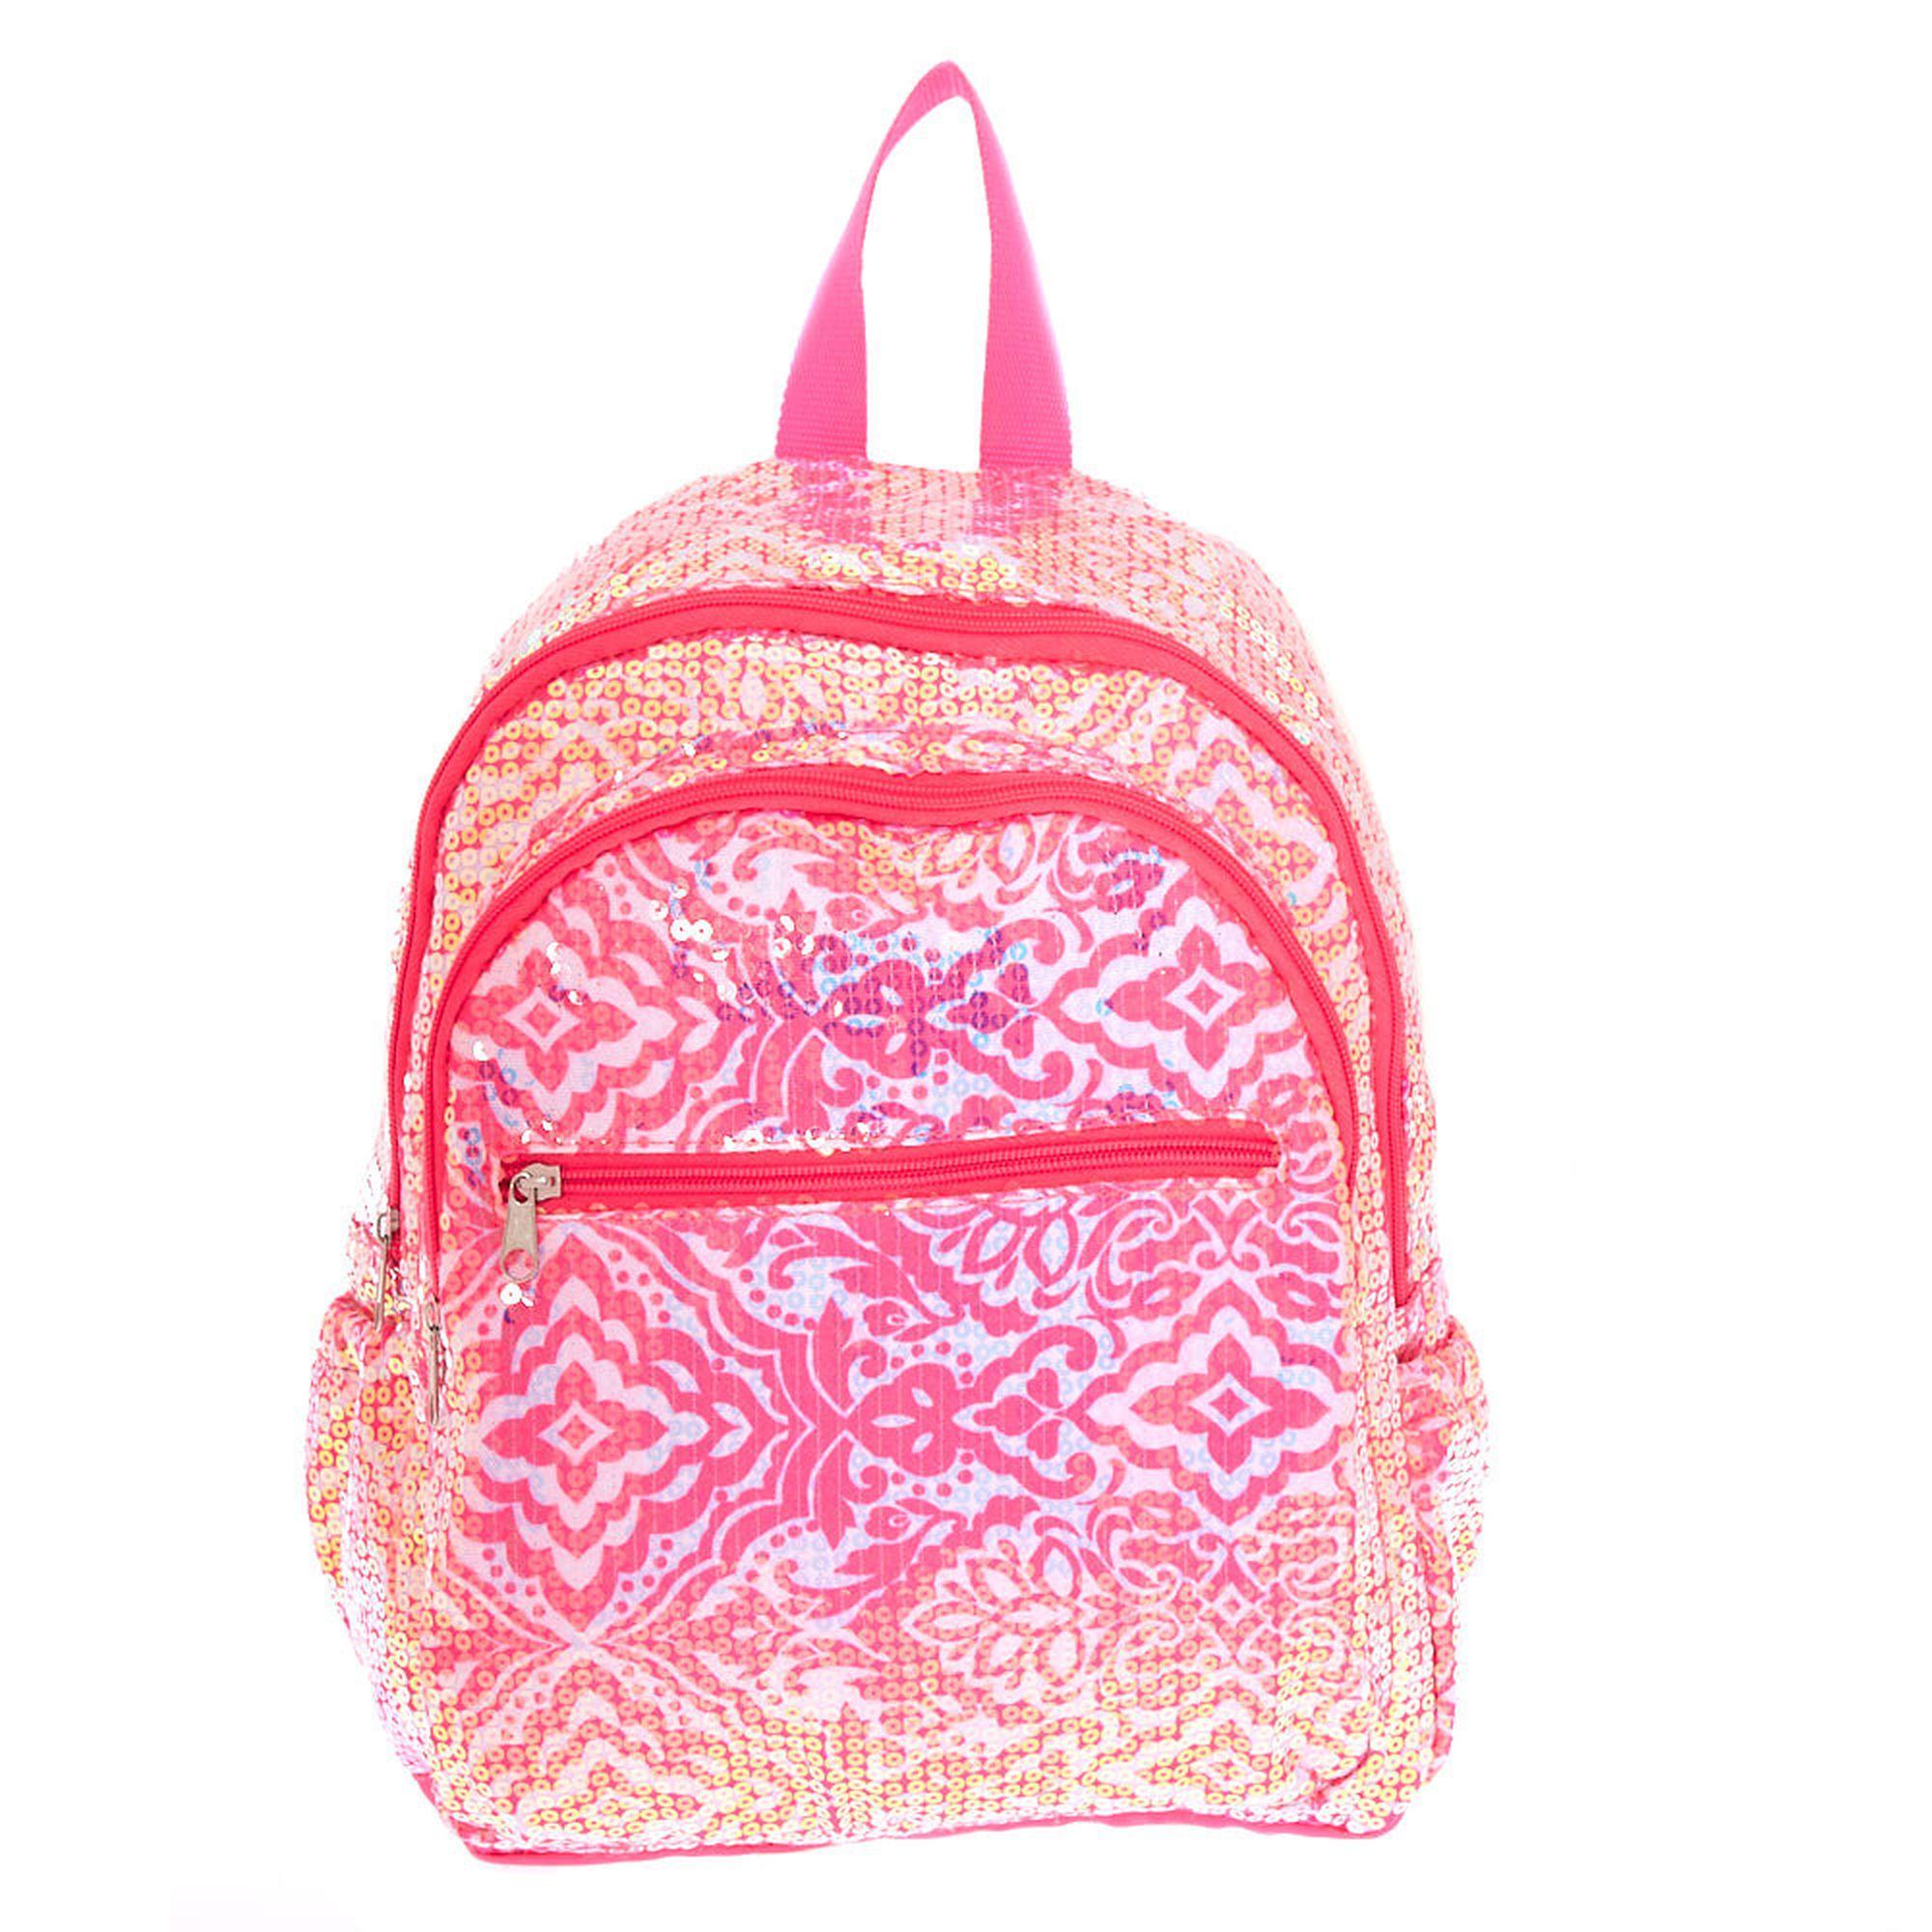 9ccb8add5113ef Funky Sequin Backpack - Pink | Back 2 School | Sequin backpack ...